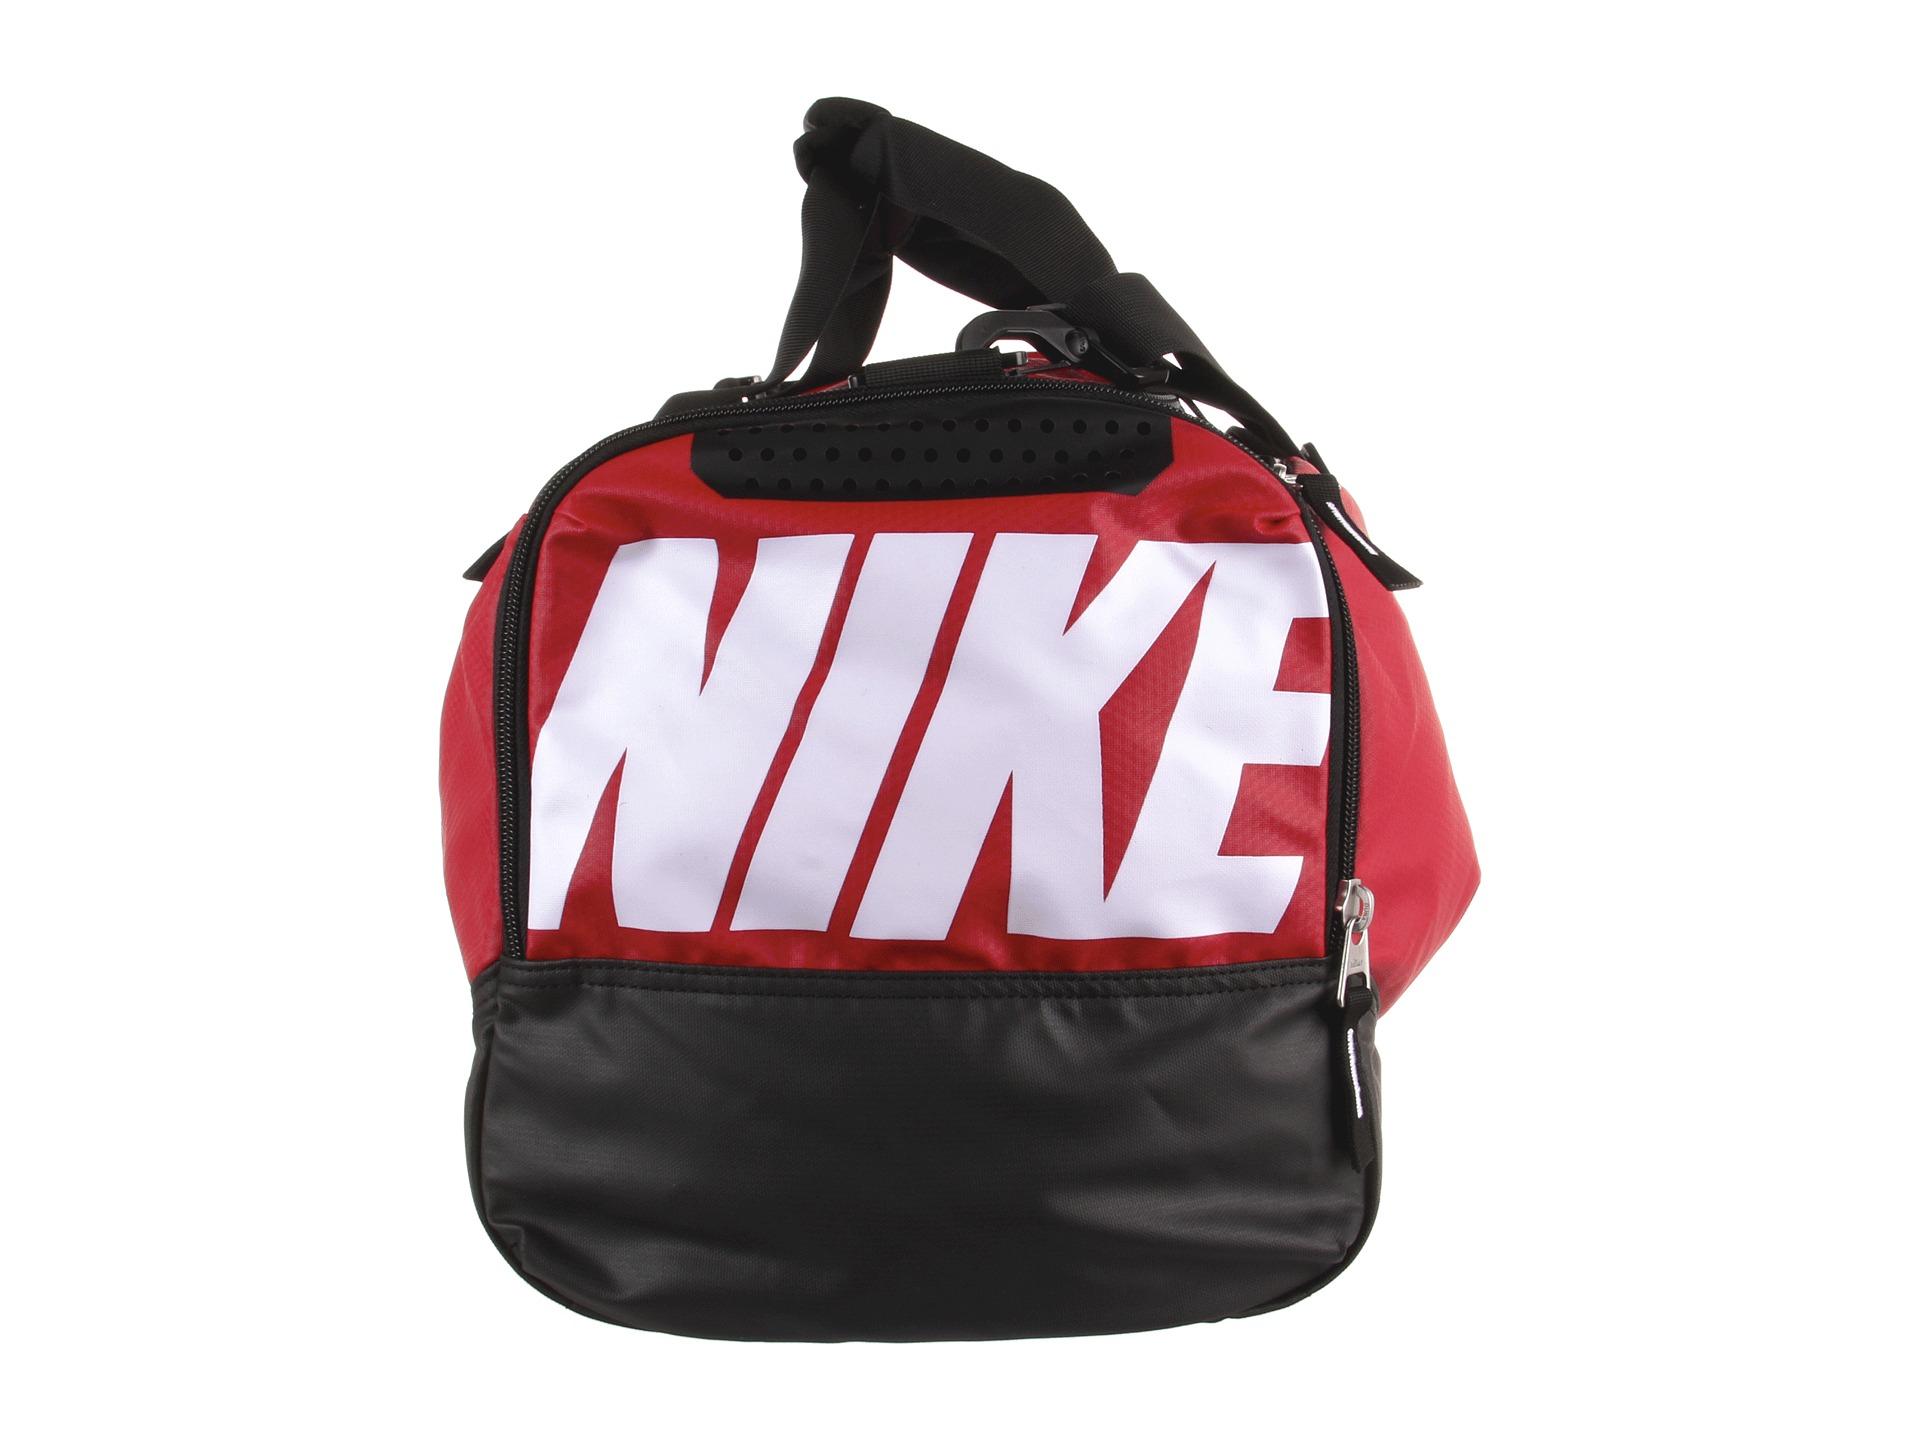 Nike Small Red Duffle Bag  40493c20dd930